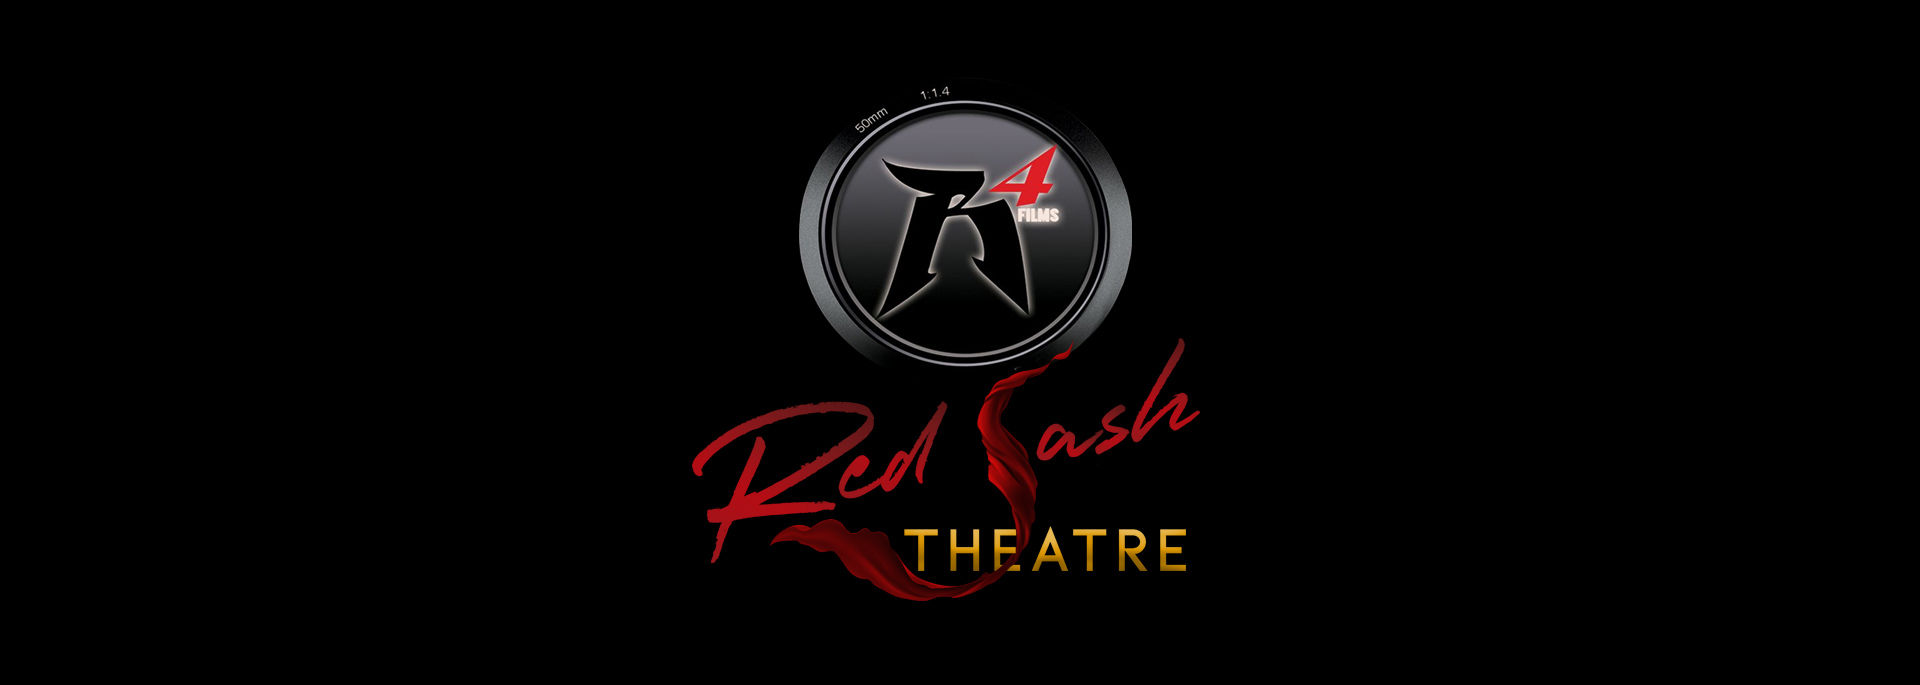 RED SASH THEATRE